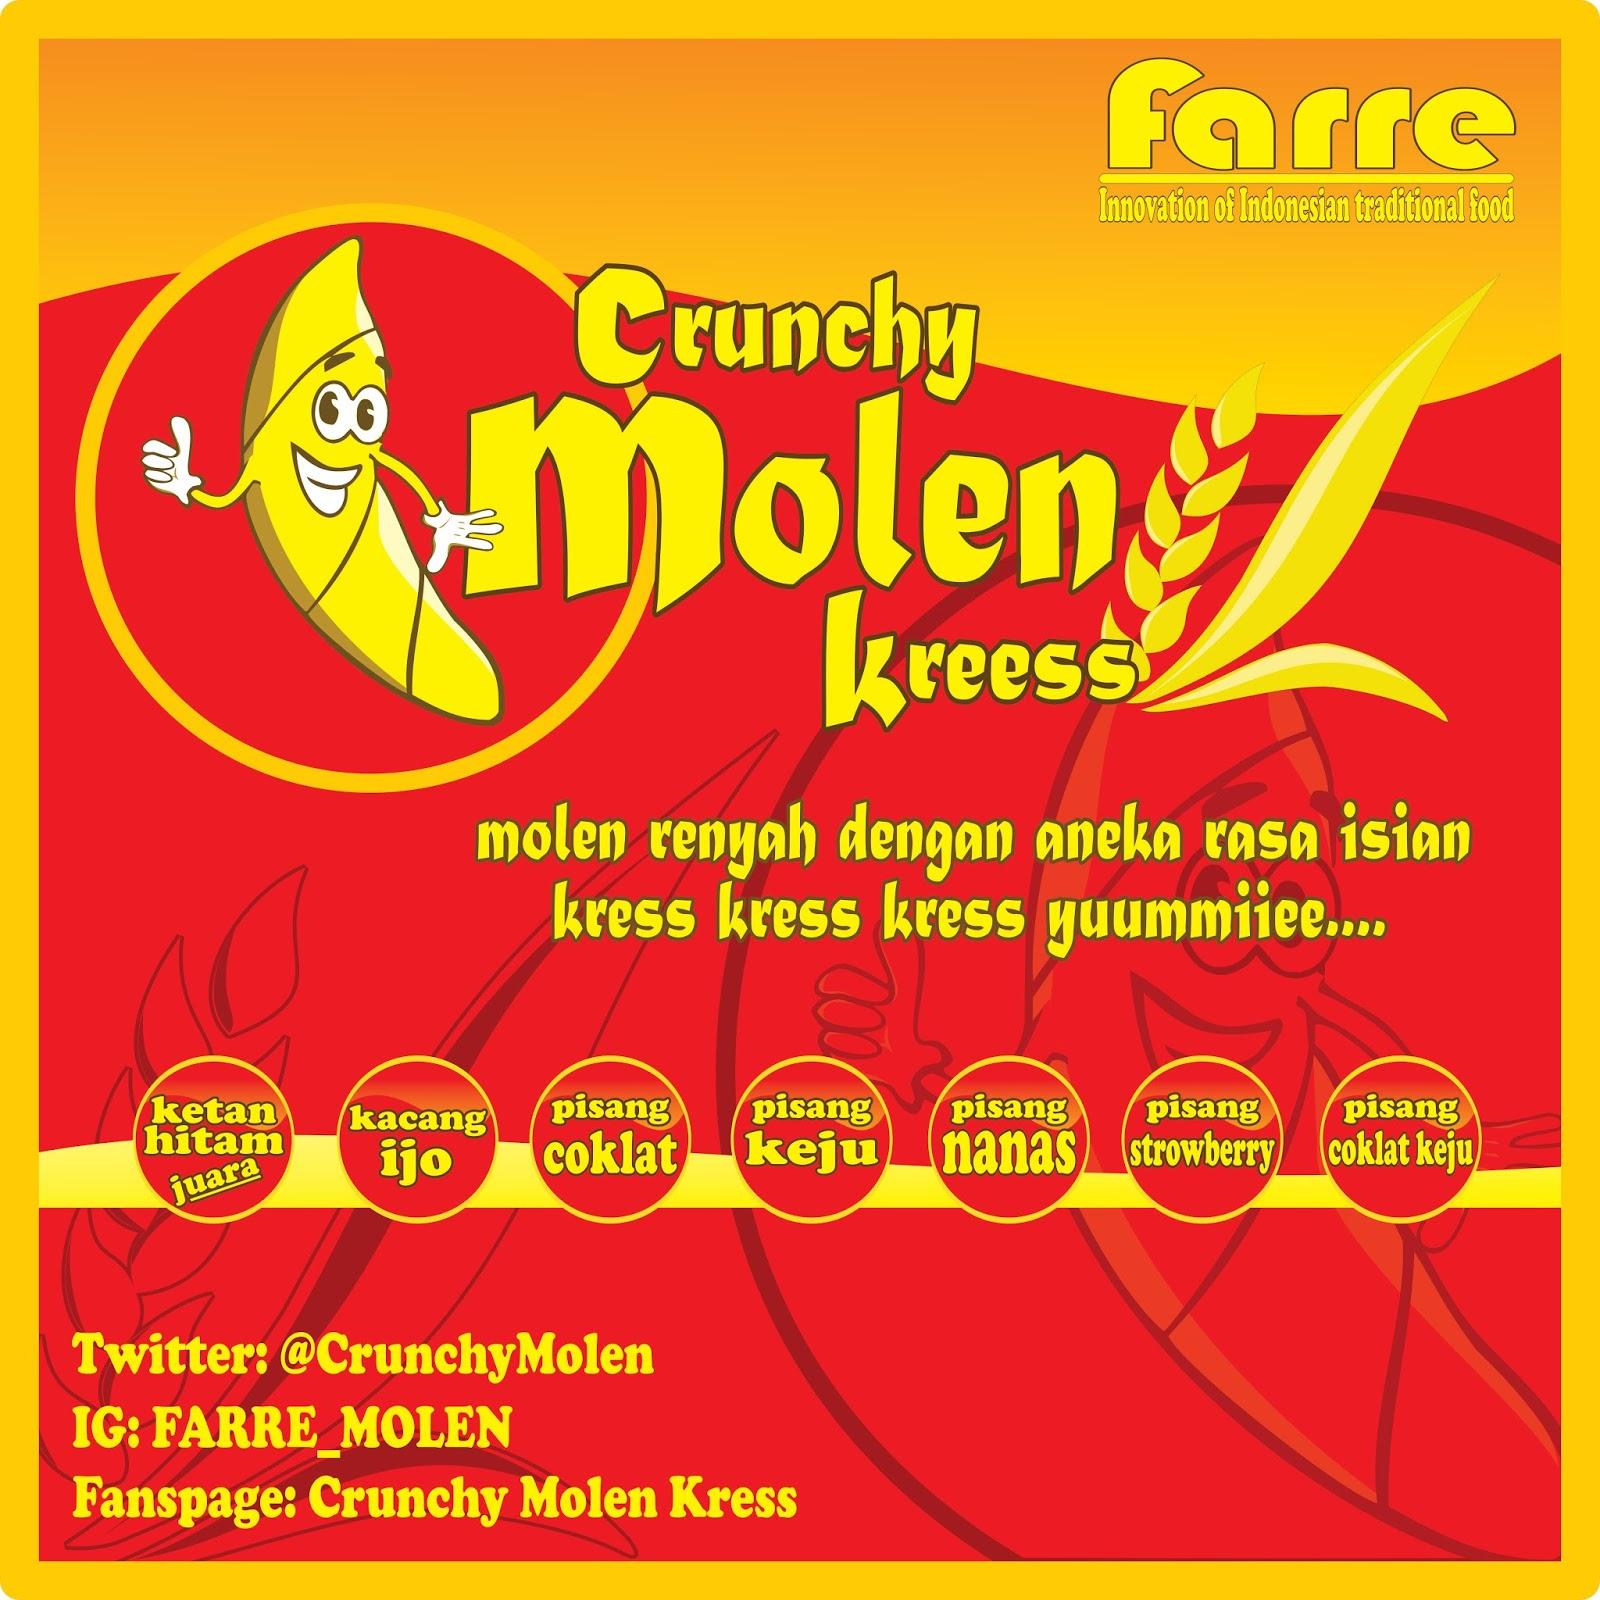 Lowongan Kerja Crunchy Molen Kreess Solo - Ayo Kerja